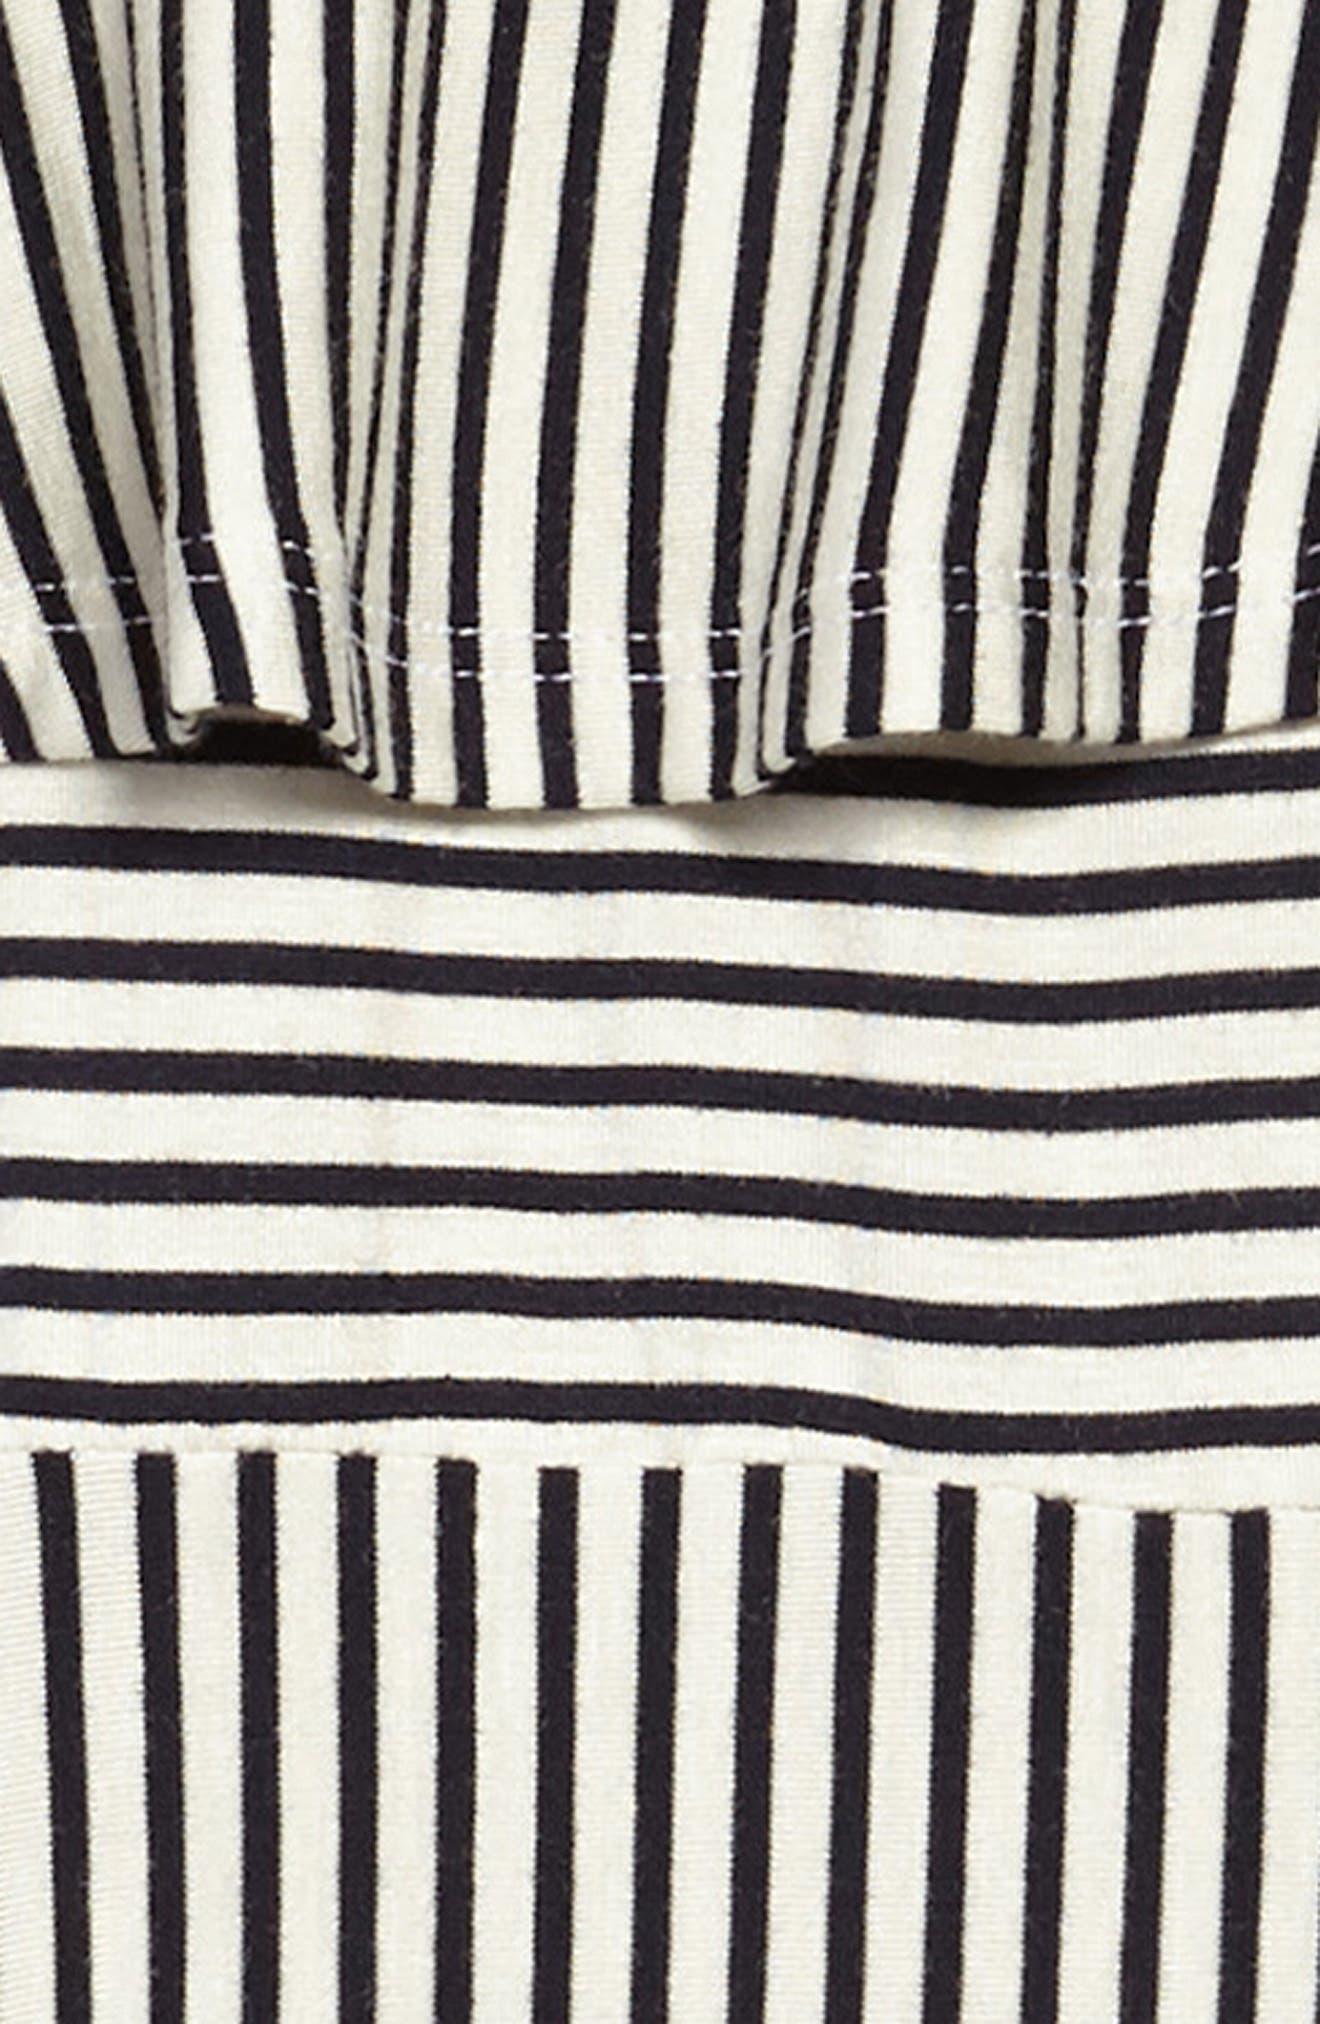 Stripe Cold Shoulder Dress,                             Alternate thumbnail 3, color,                             Black/ White